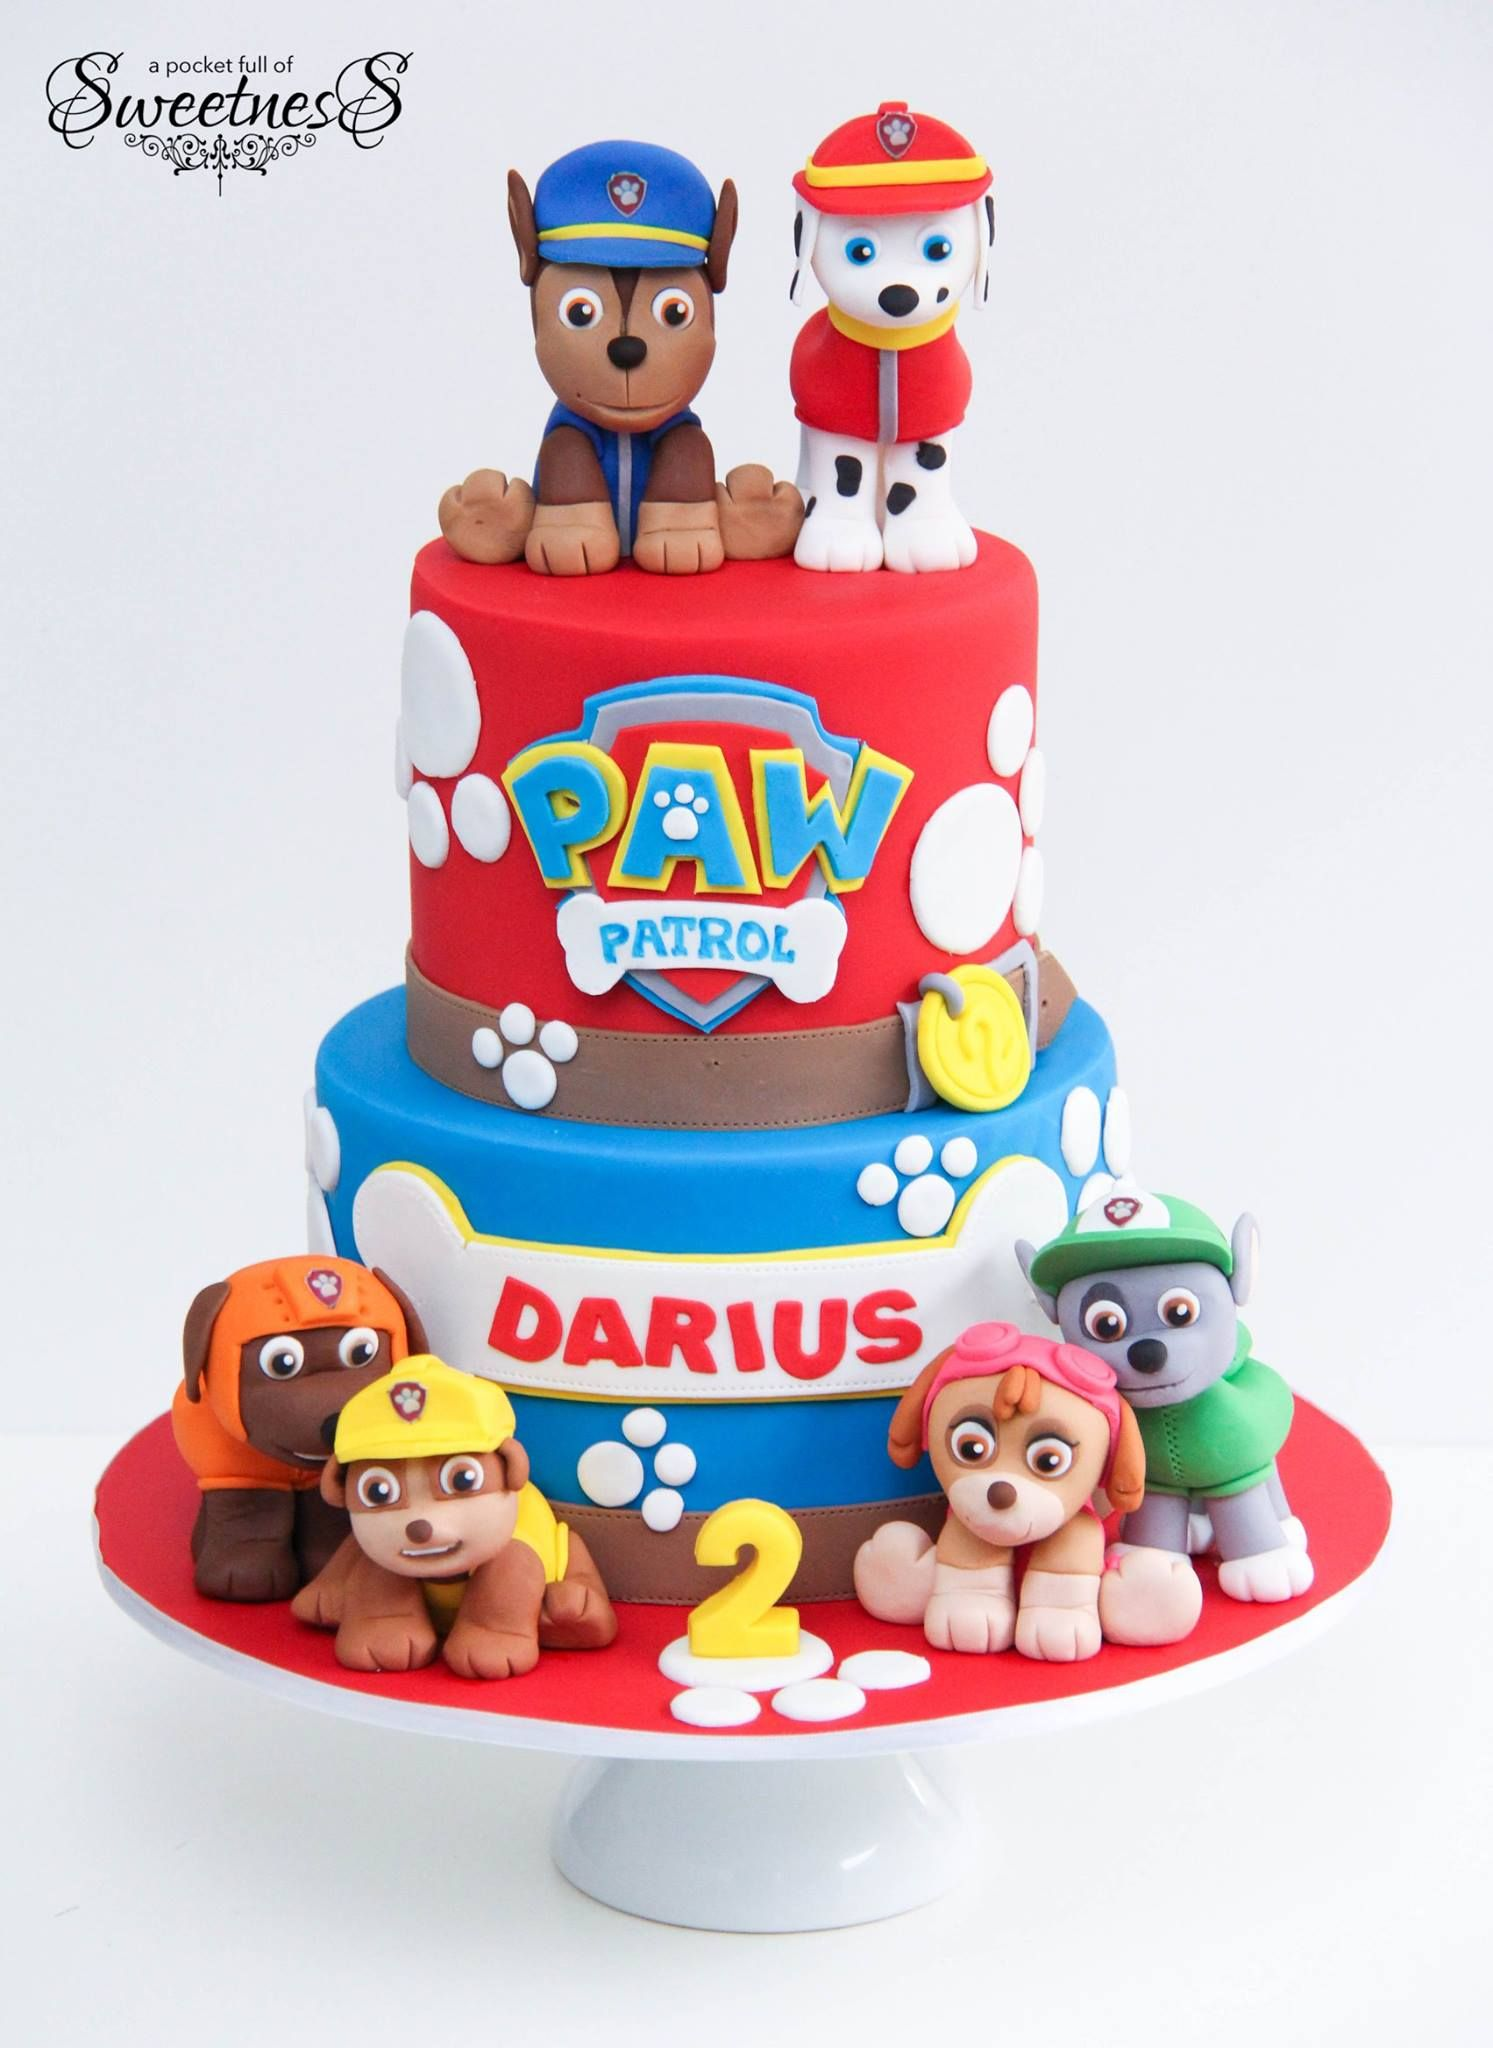 Paw Patrol A Pocket Full Of Sweetness Facebook Paw Patrol Birthday Cake Paw Patrol Cake Boy Birthday Cake